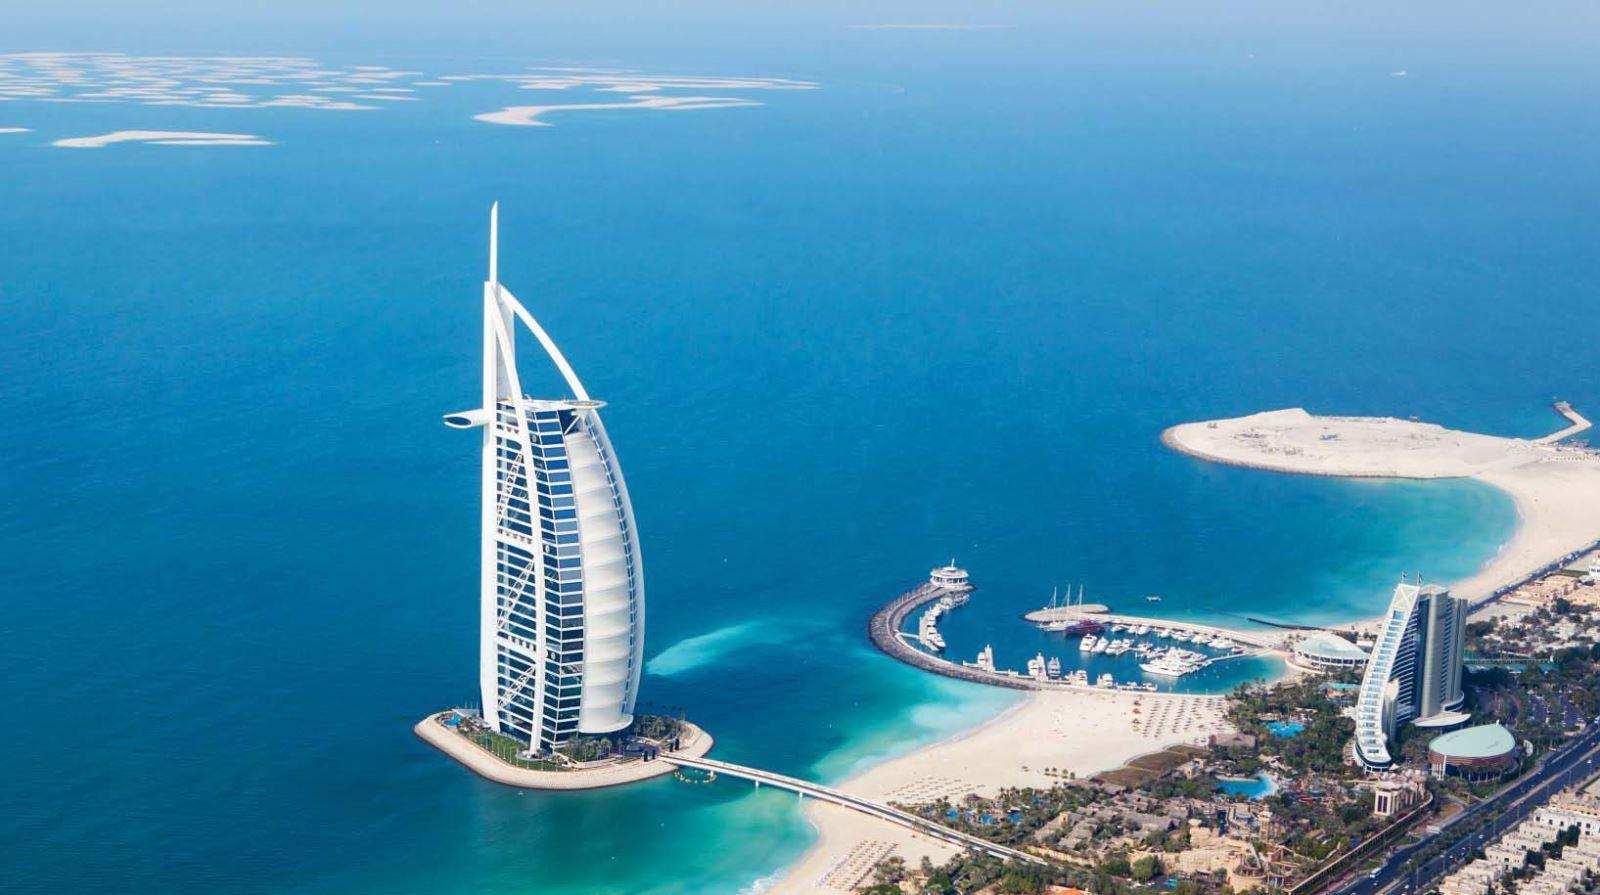 Khách sạn 7 sao Burj AlArab - Dubai